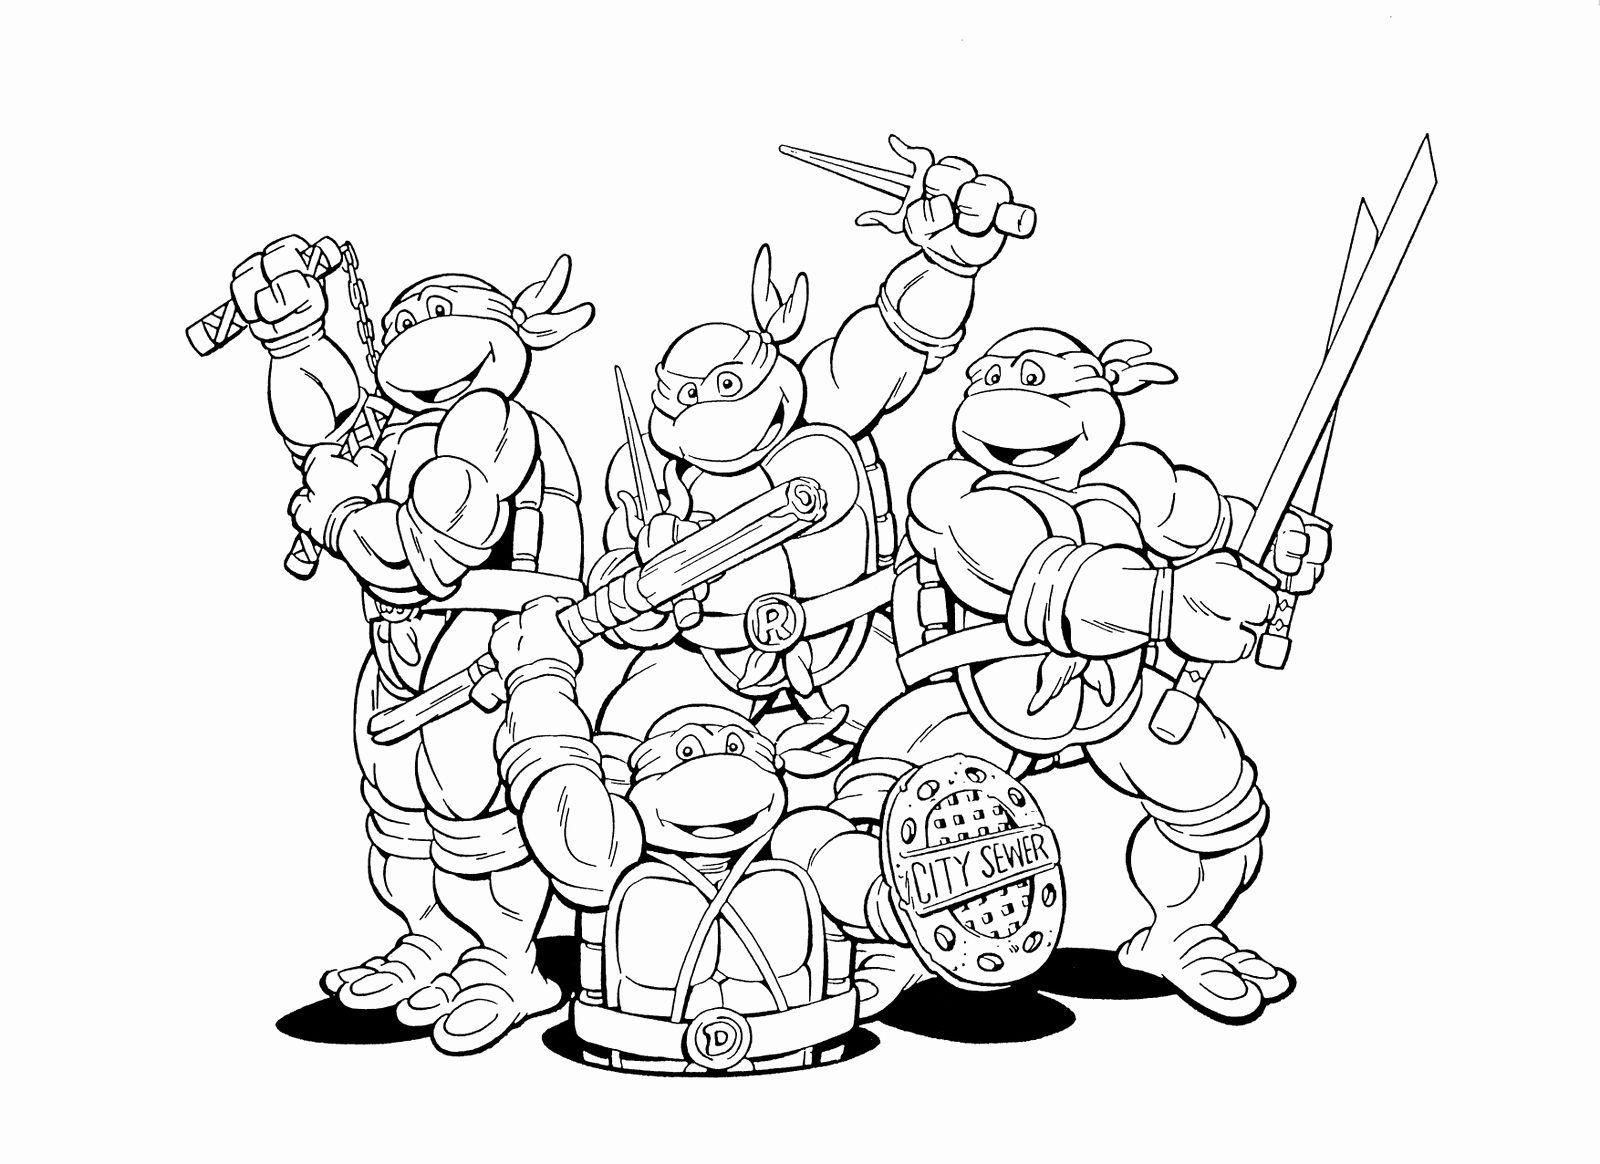 Teenage Mutant Ninja Turtles Coloring Page New Craftoholic Teenage Mutant Ninja Turt In 2020 Turtle Coloring Pages Superhero Coloring Pages Ninja Turtle Coloring Pages